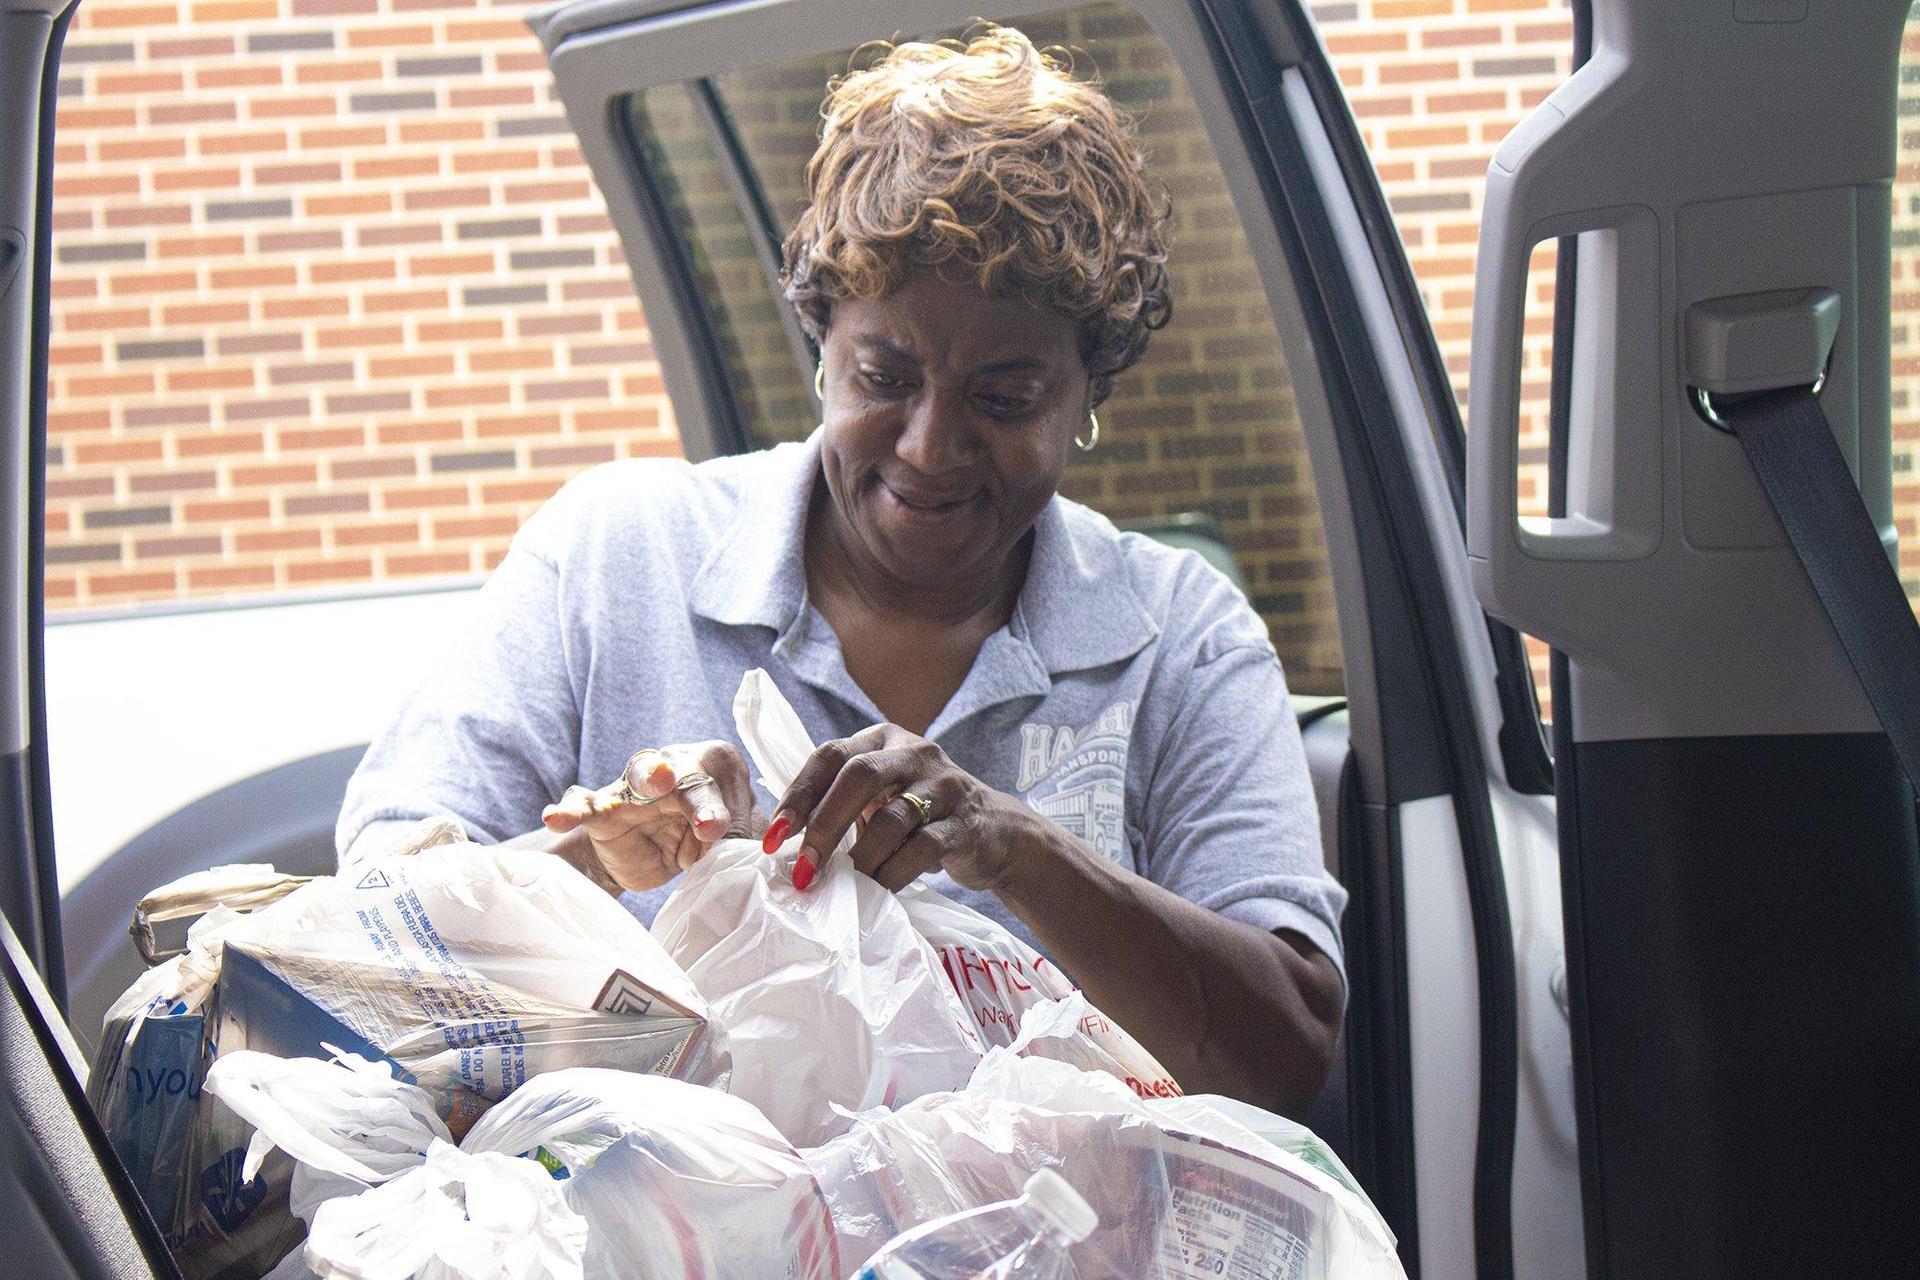 woman in back of van unloading groceries